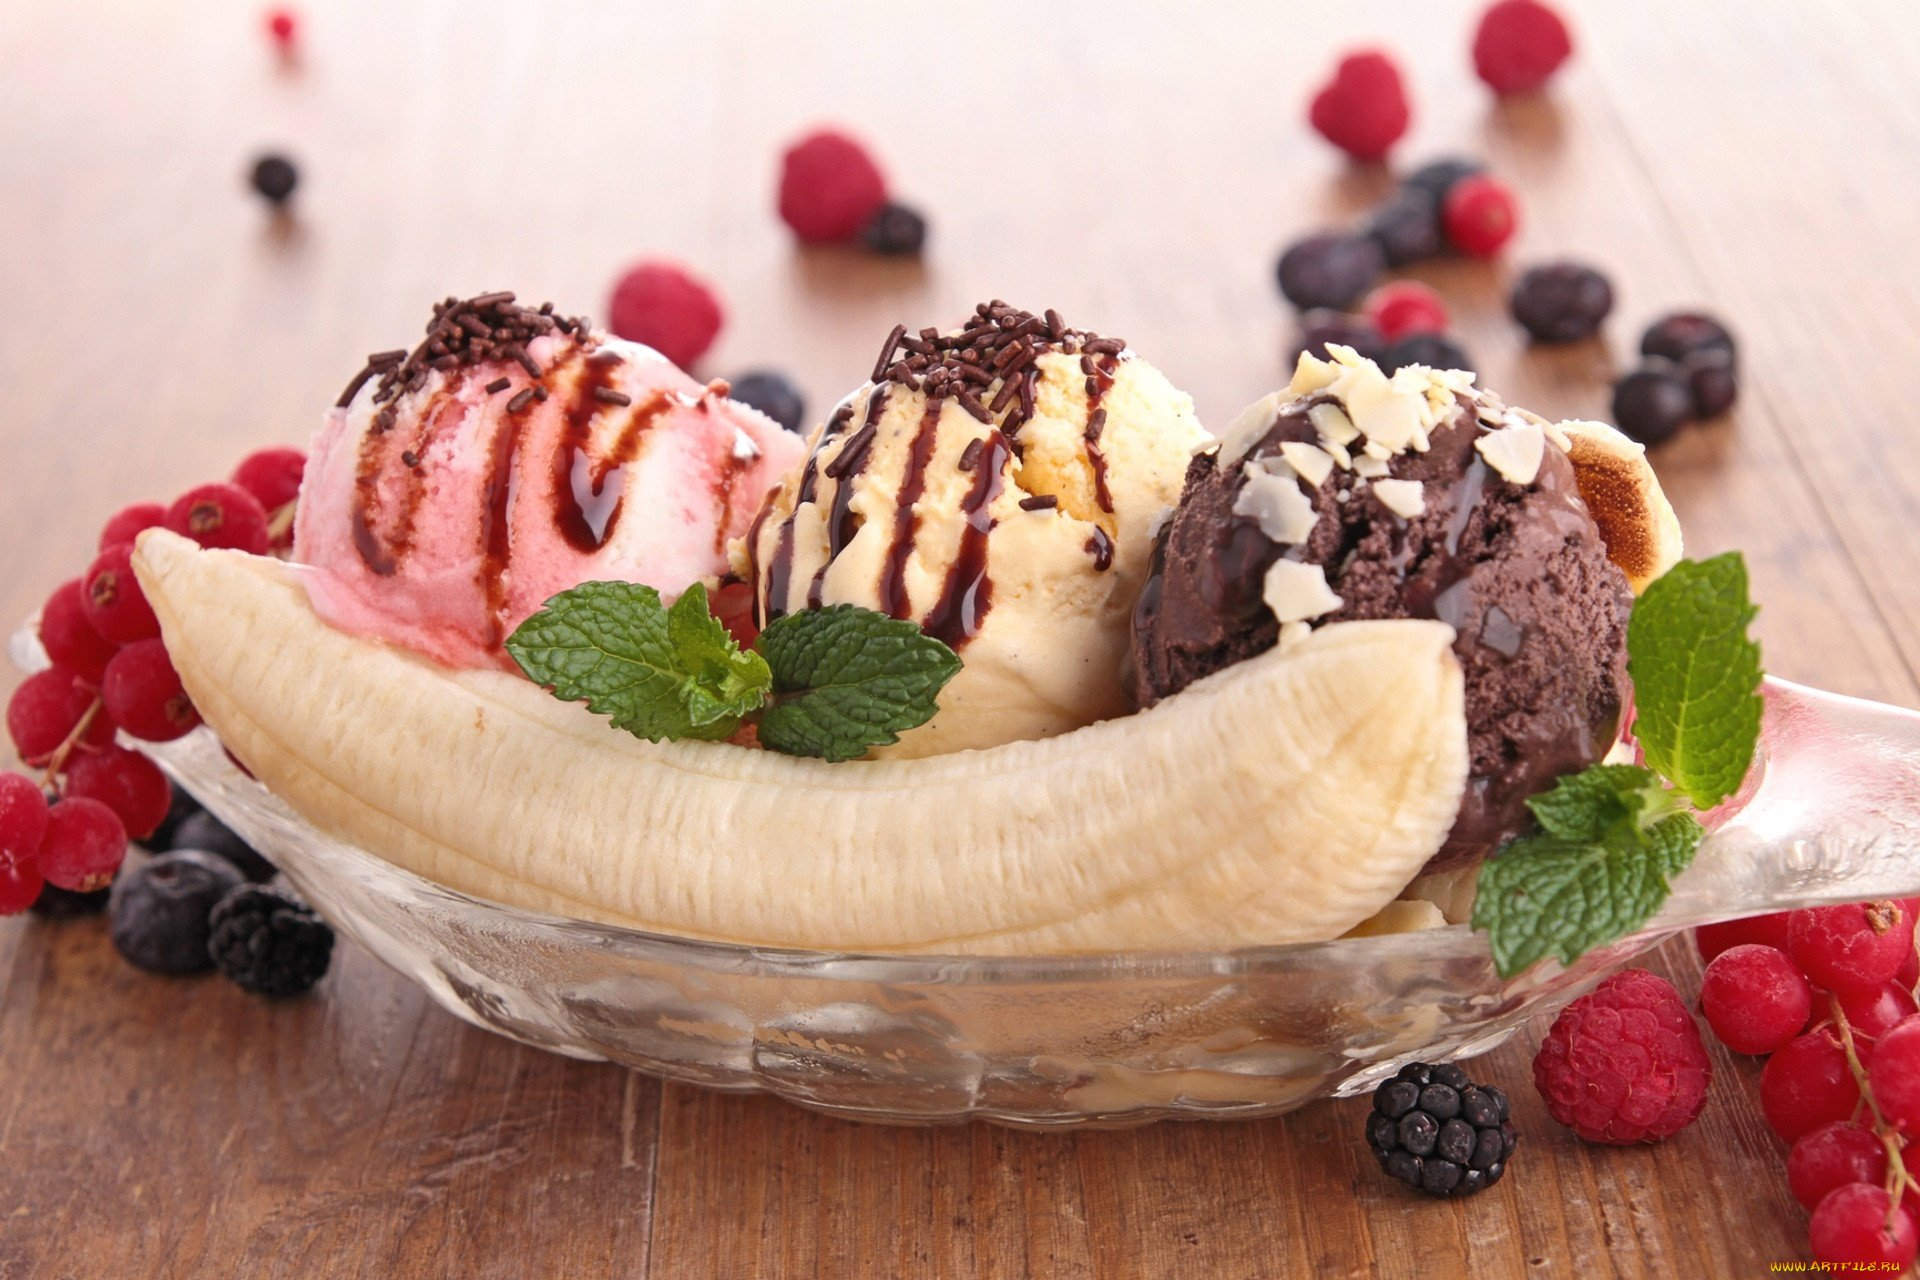 Пп мороженое из банана: топ-12 рецептов в домашних условиях